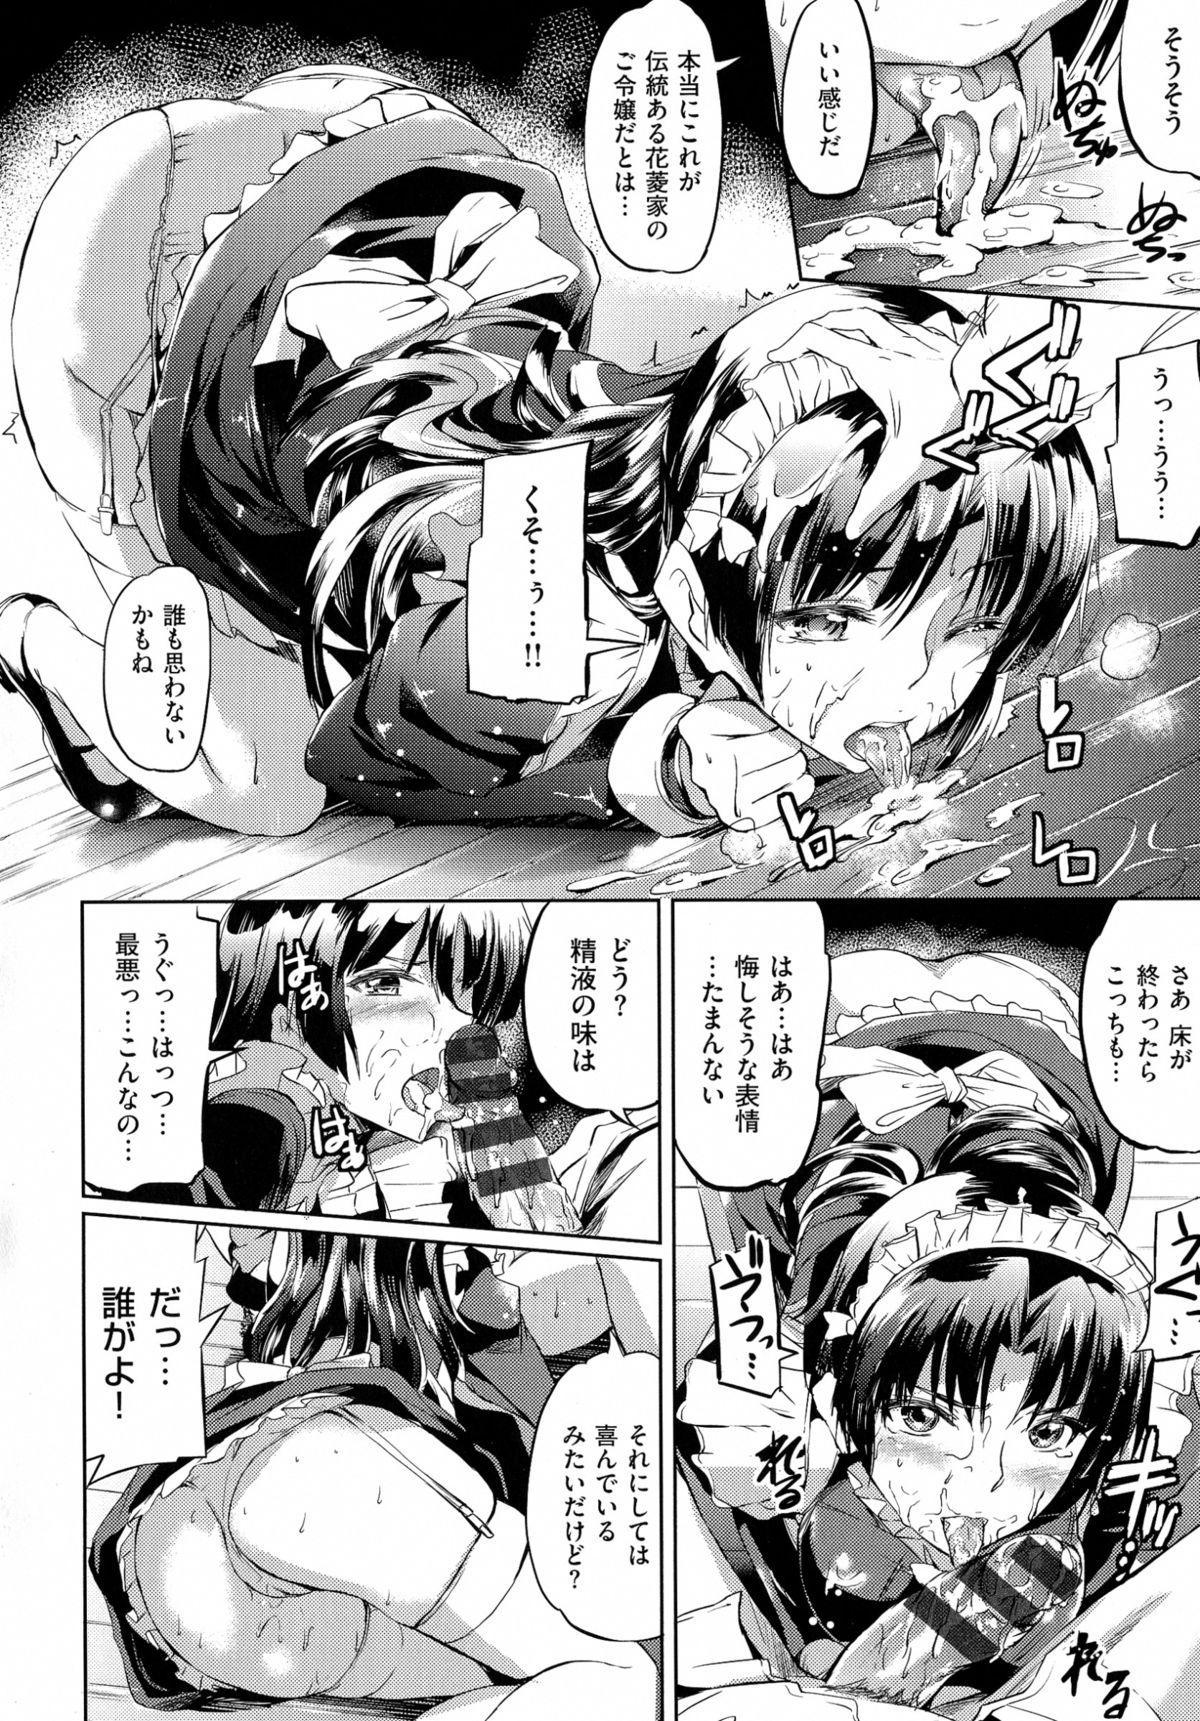 Ojousama no Maid Jijou 113